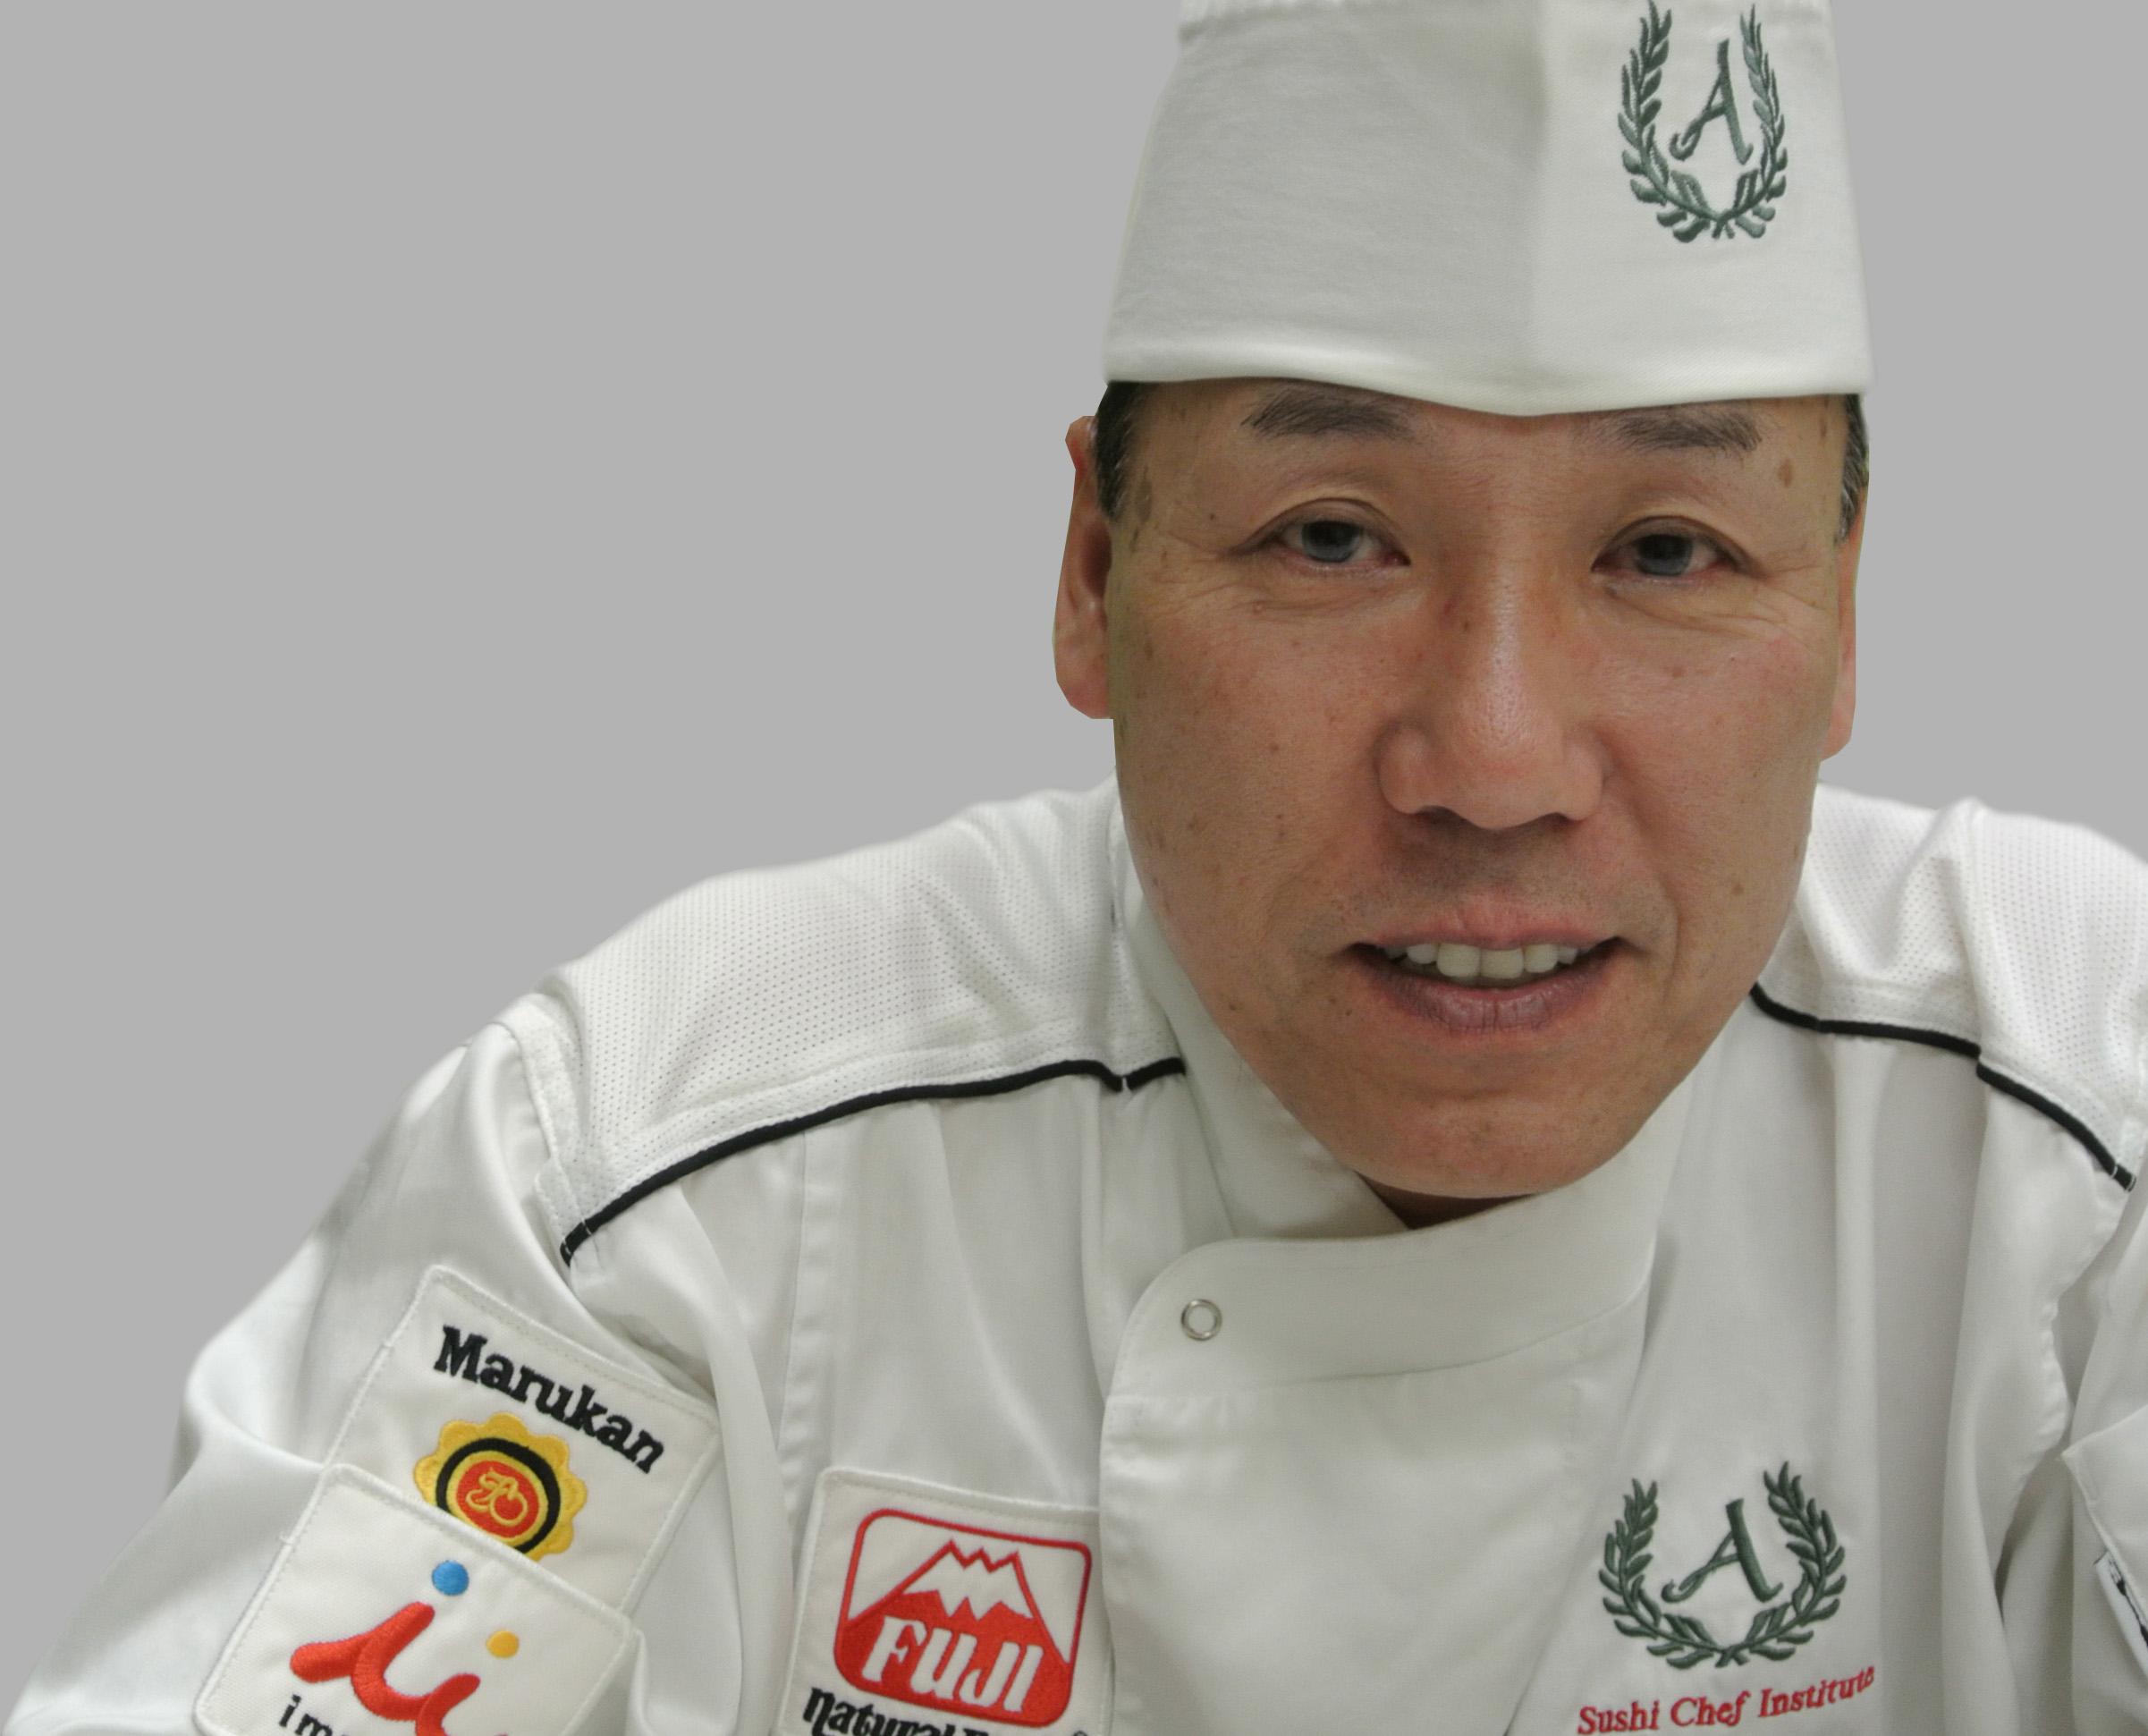 Chef Andy Matsuda